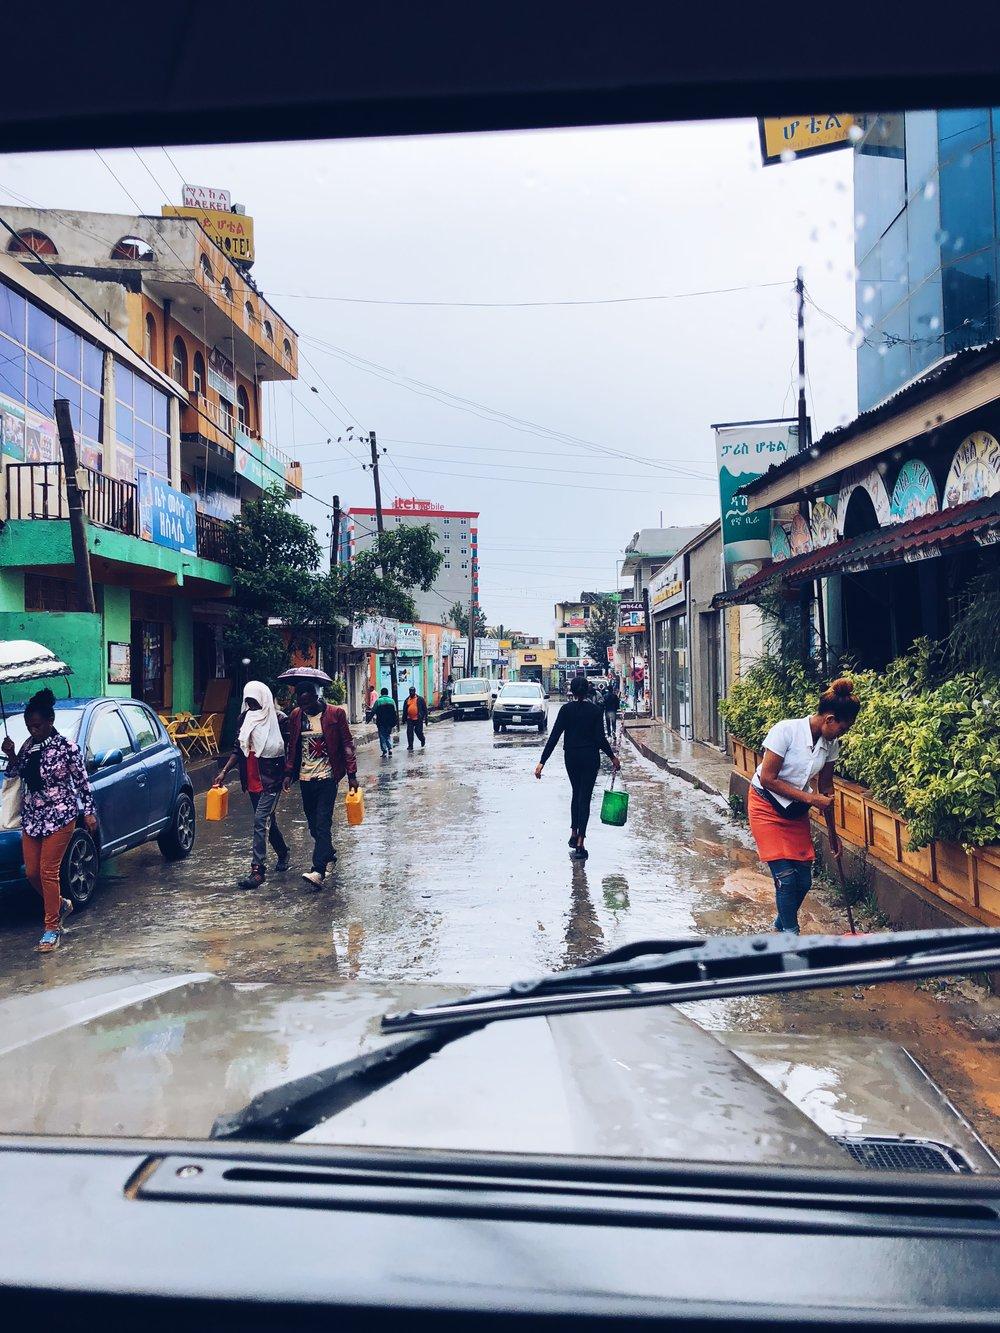 Mekelle-Ethiopia-city